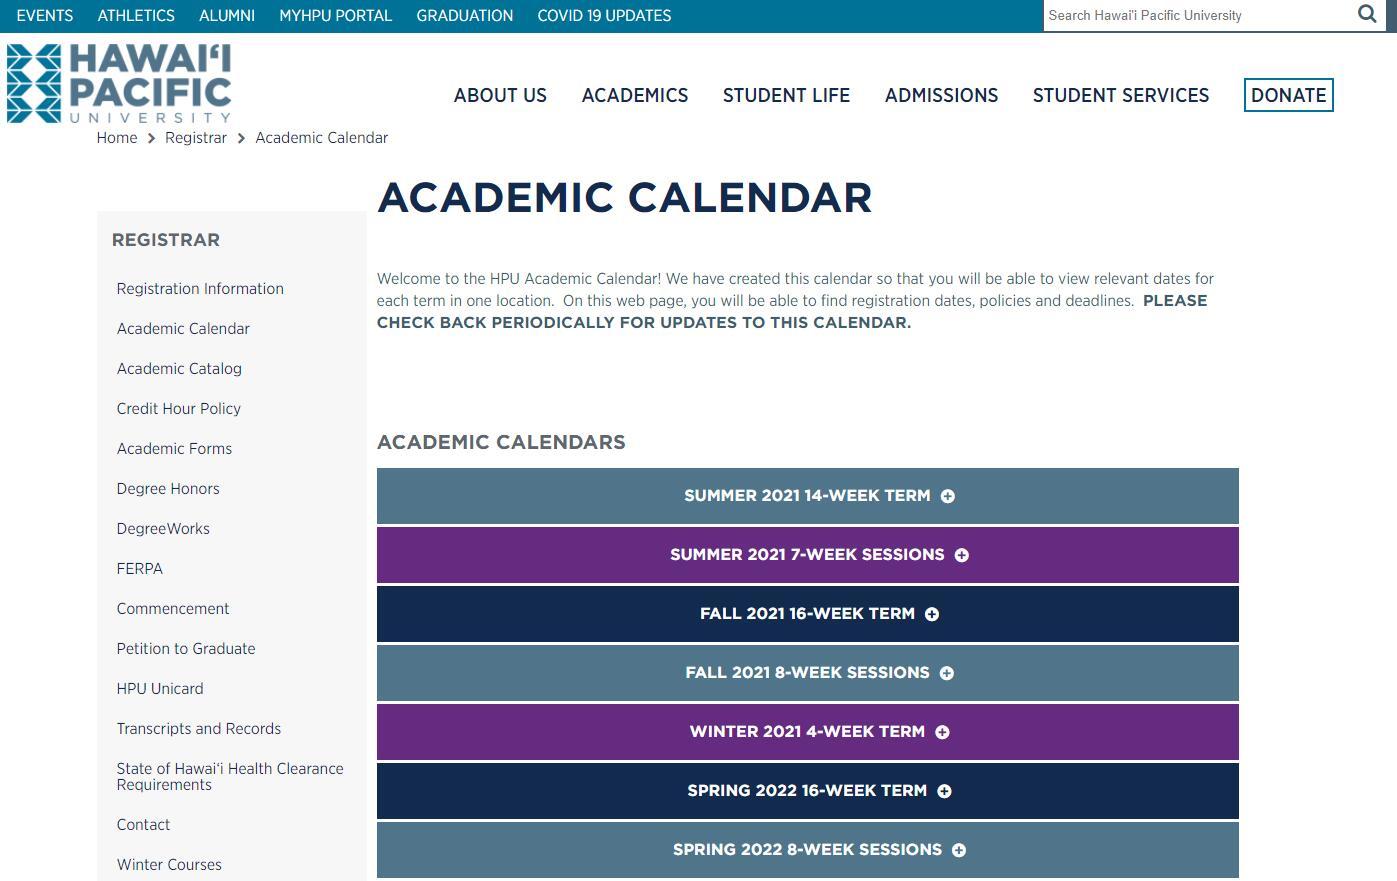 Academic Calendar - Hawaii Pacific University